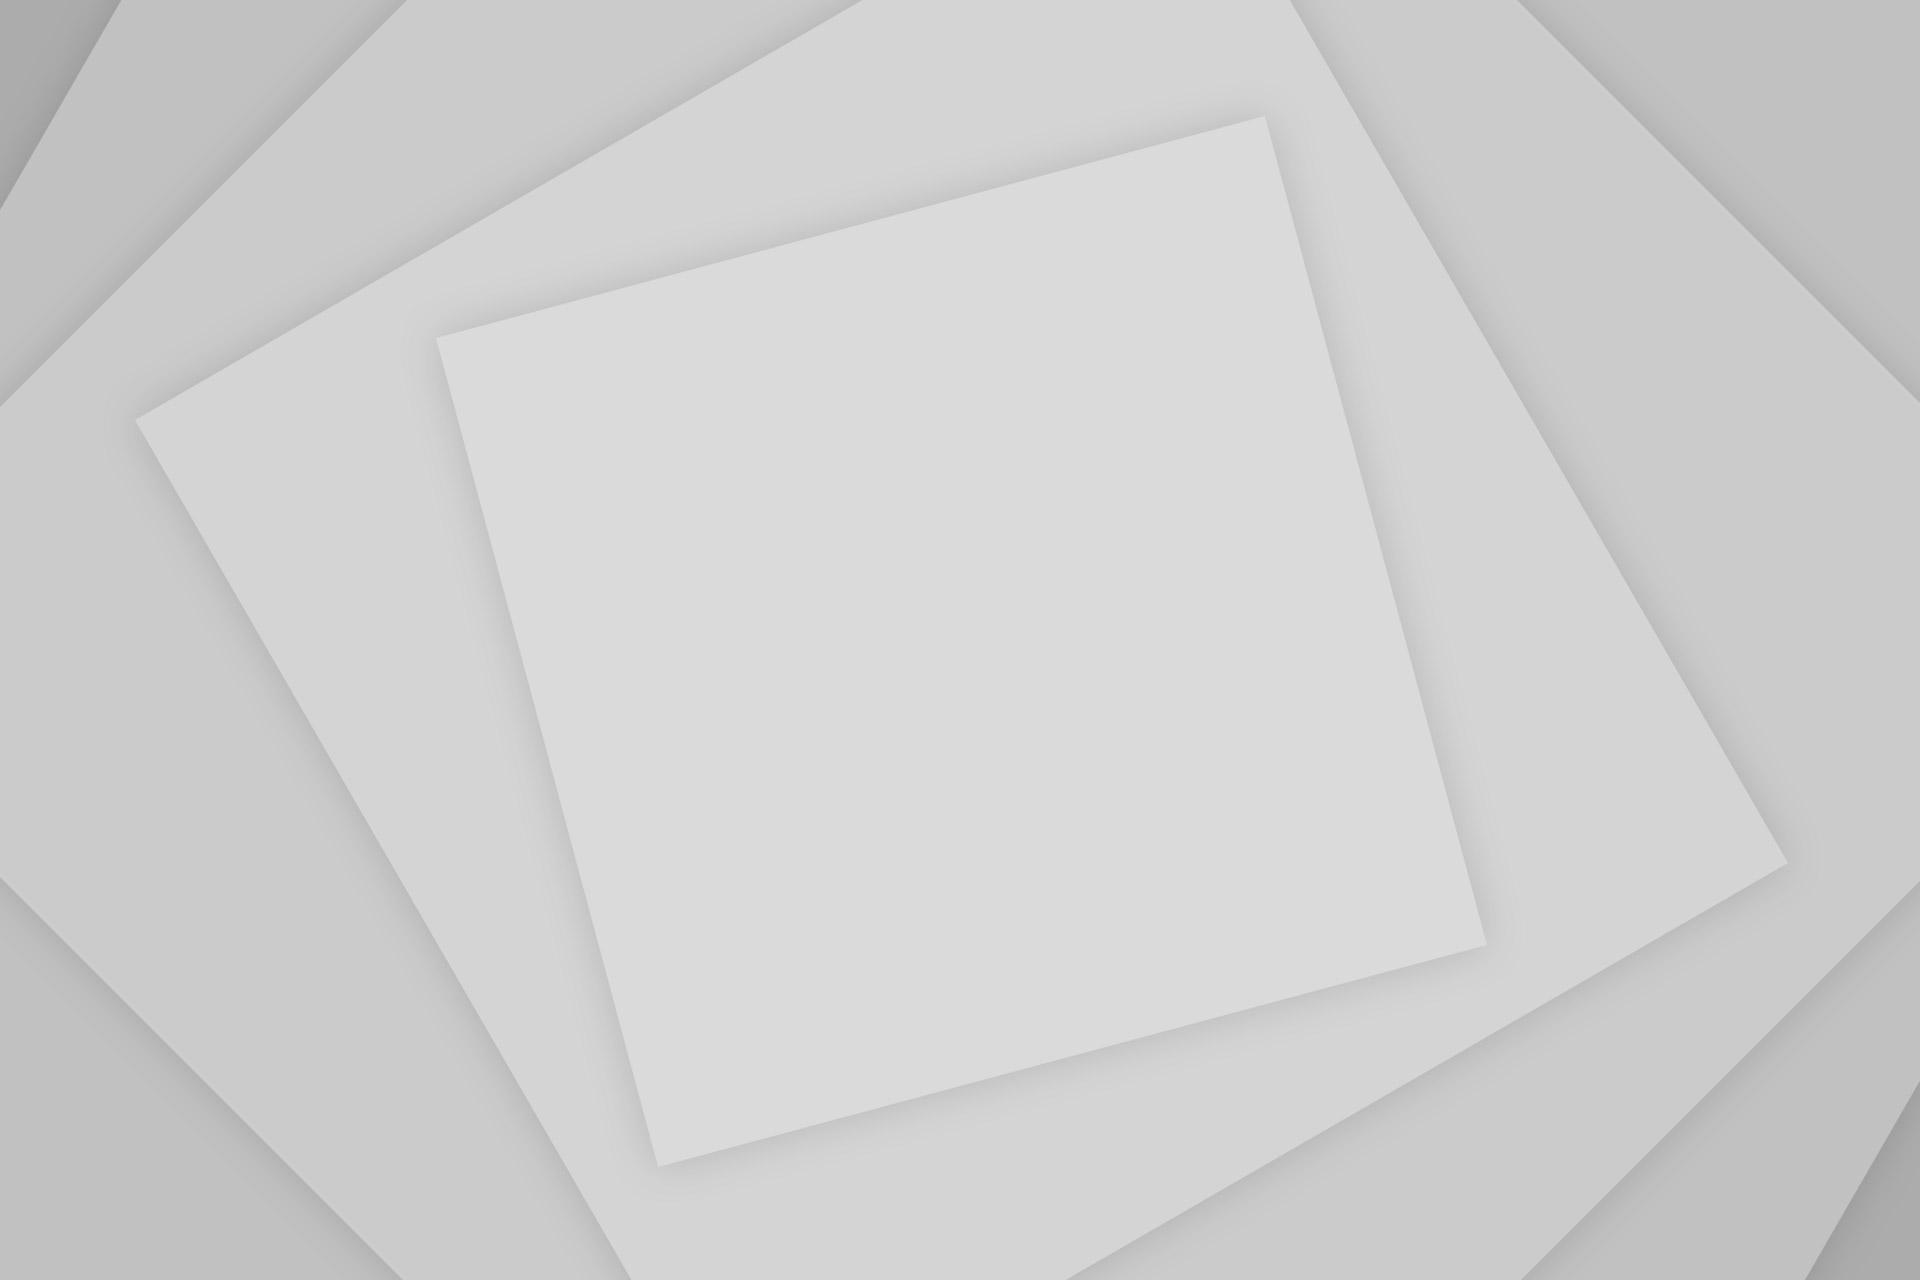 Vestibular 2017 da Uni-FACEF tem inscrições abertas